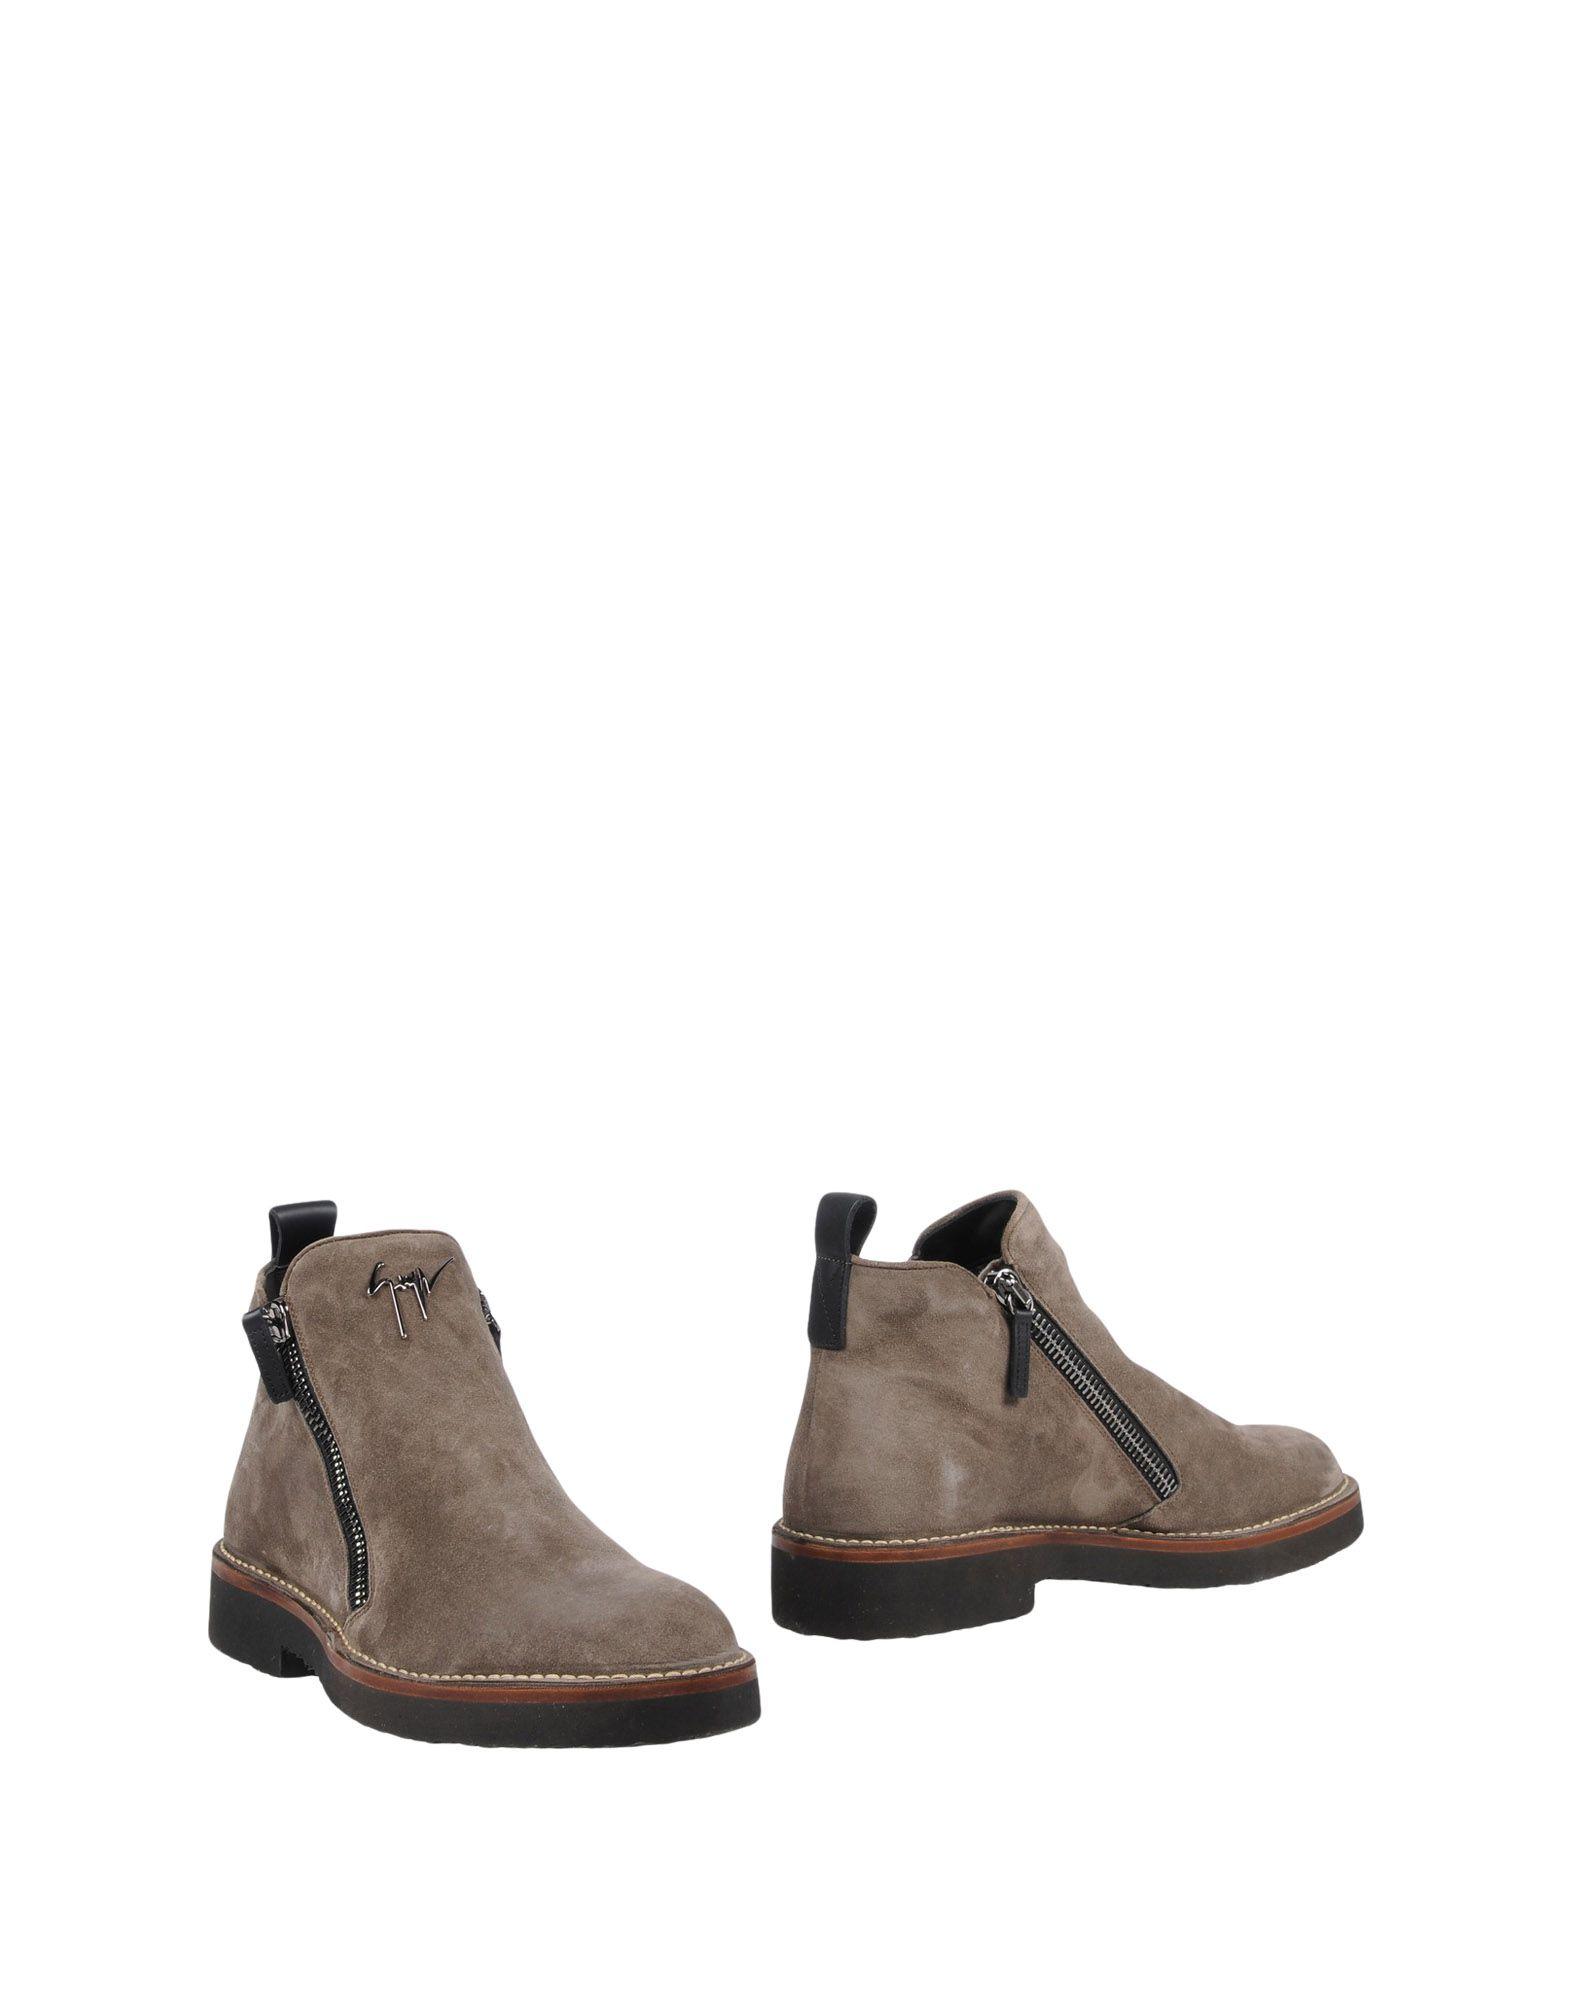 Giuseppe Zanotti Gute Stiefelette Herren  11447197EN Gute Zanotti Qualität beliebte Schuhe 4a5460